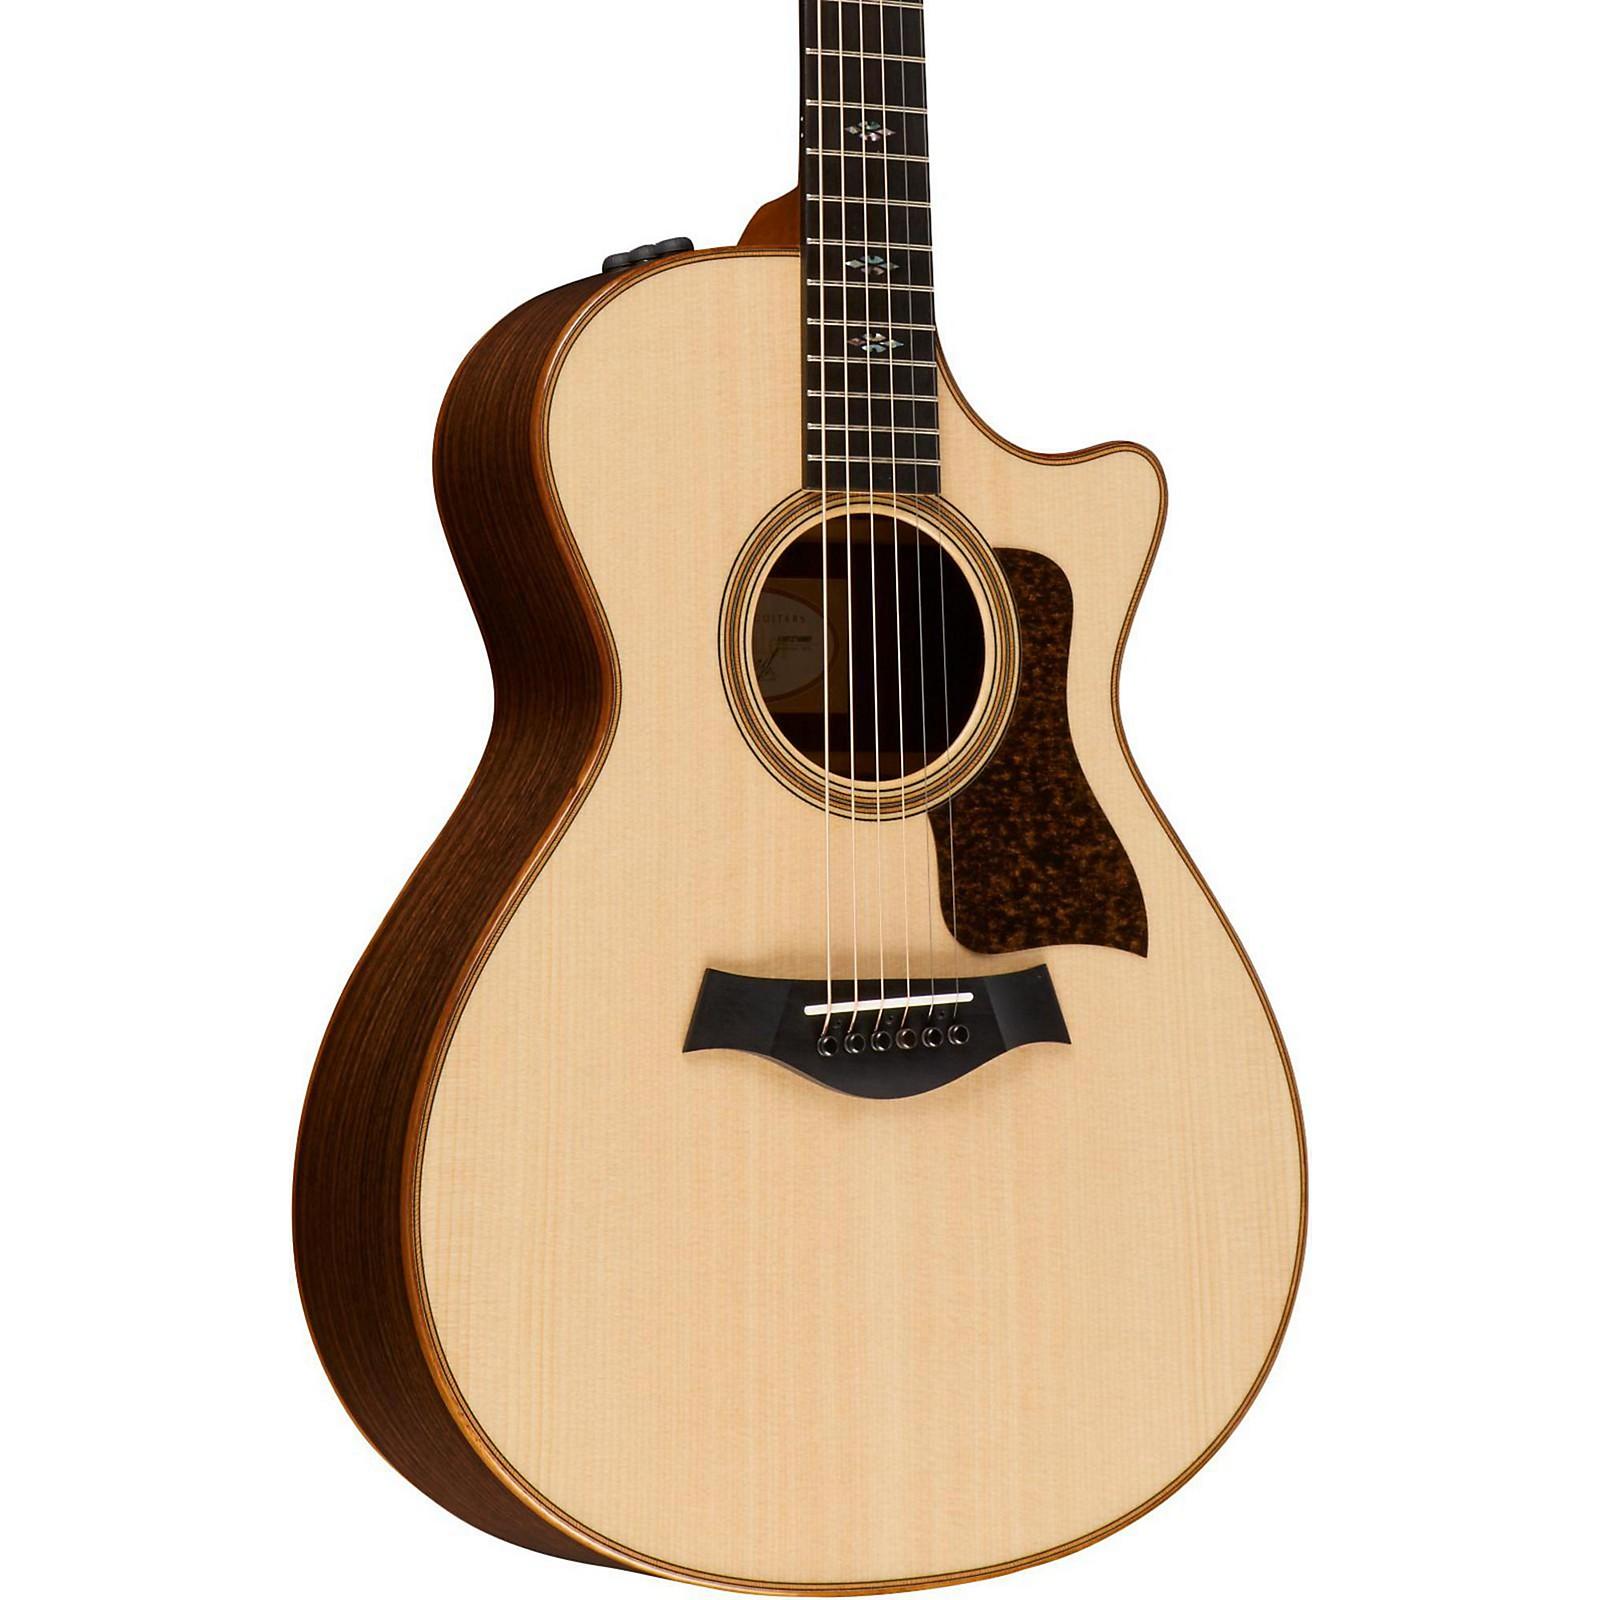 Taylor 712ce Grand Concert Acoustic-Electric Guitar